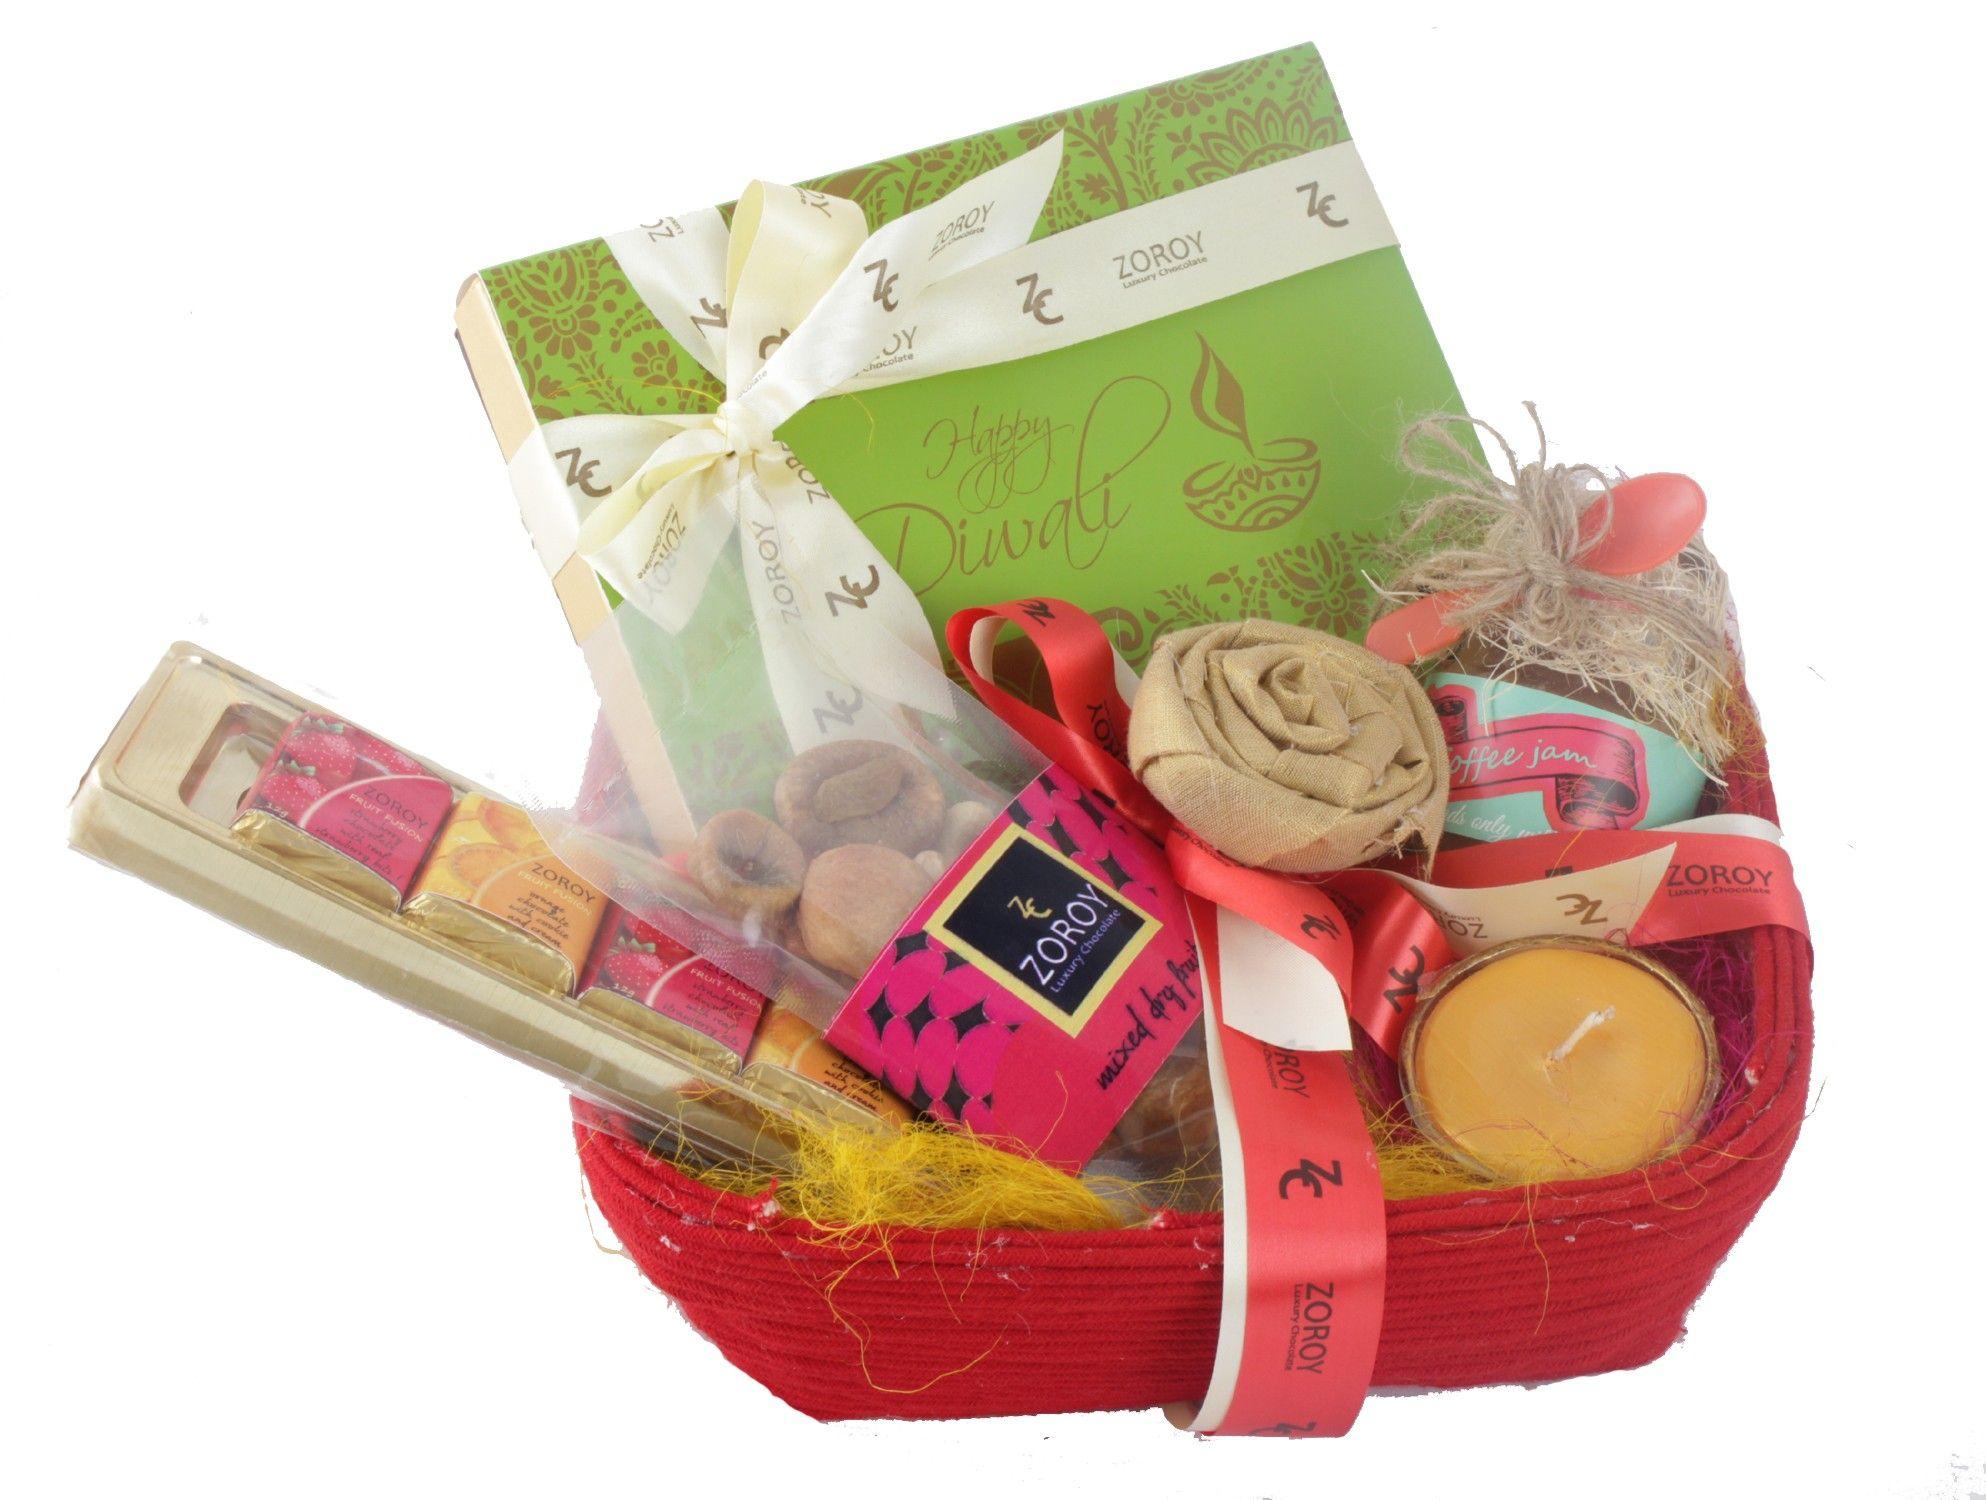 Diwali Bonanza Hamper With Chocolates Dry Fruits And